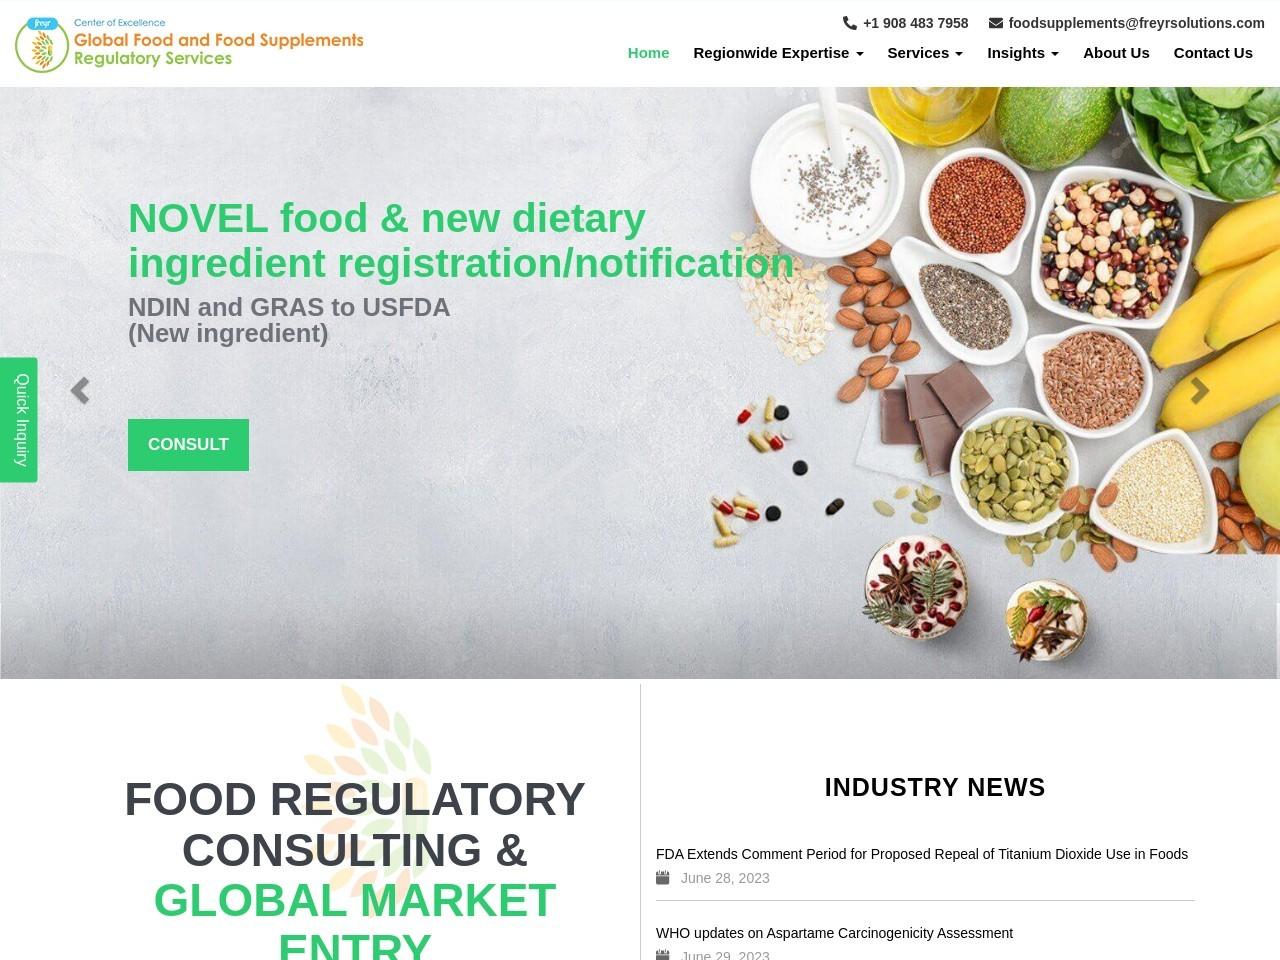 Legal representative, Food product registration, Food supplements